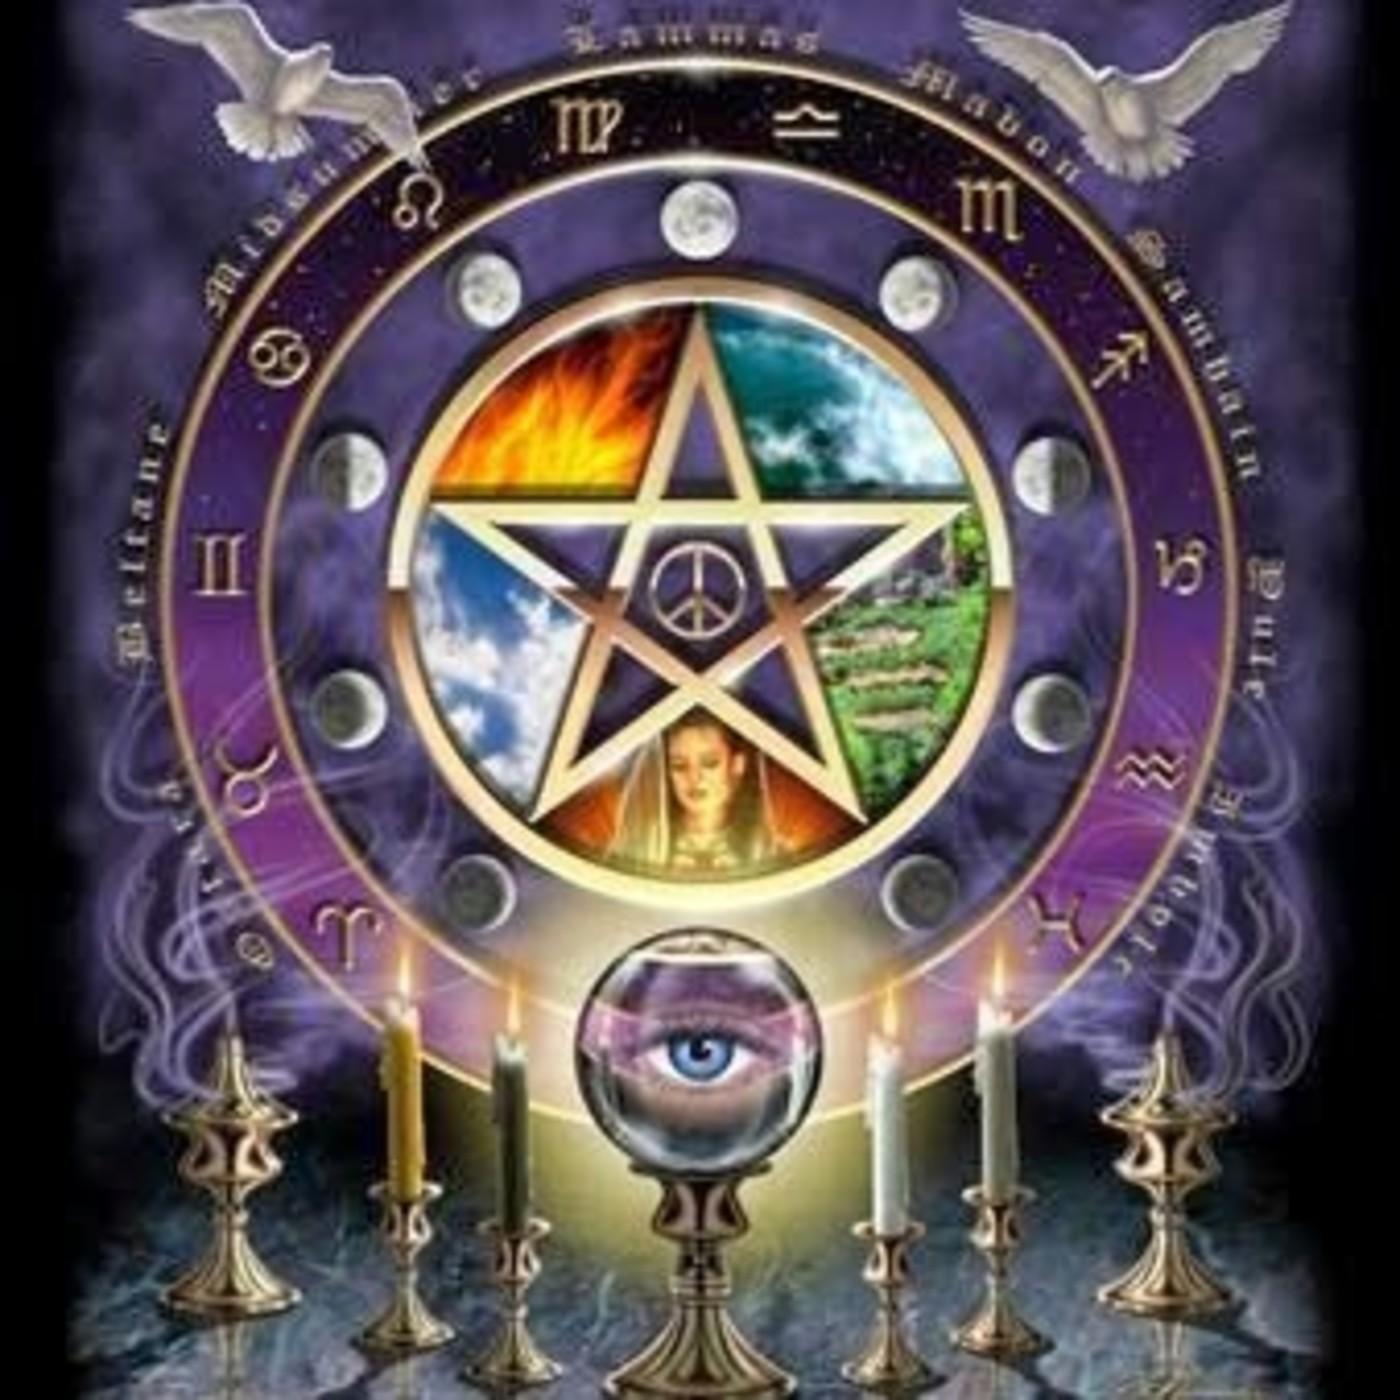 Magia, Tarot y alquimia quimica que continua en corazones varadoss